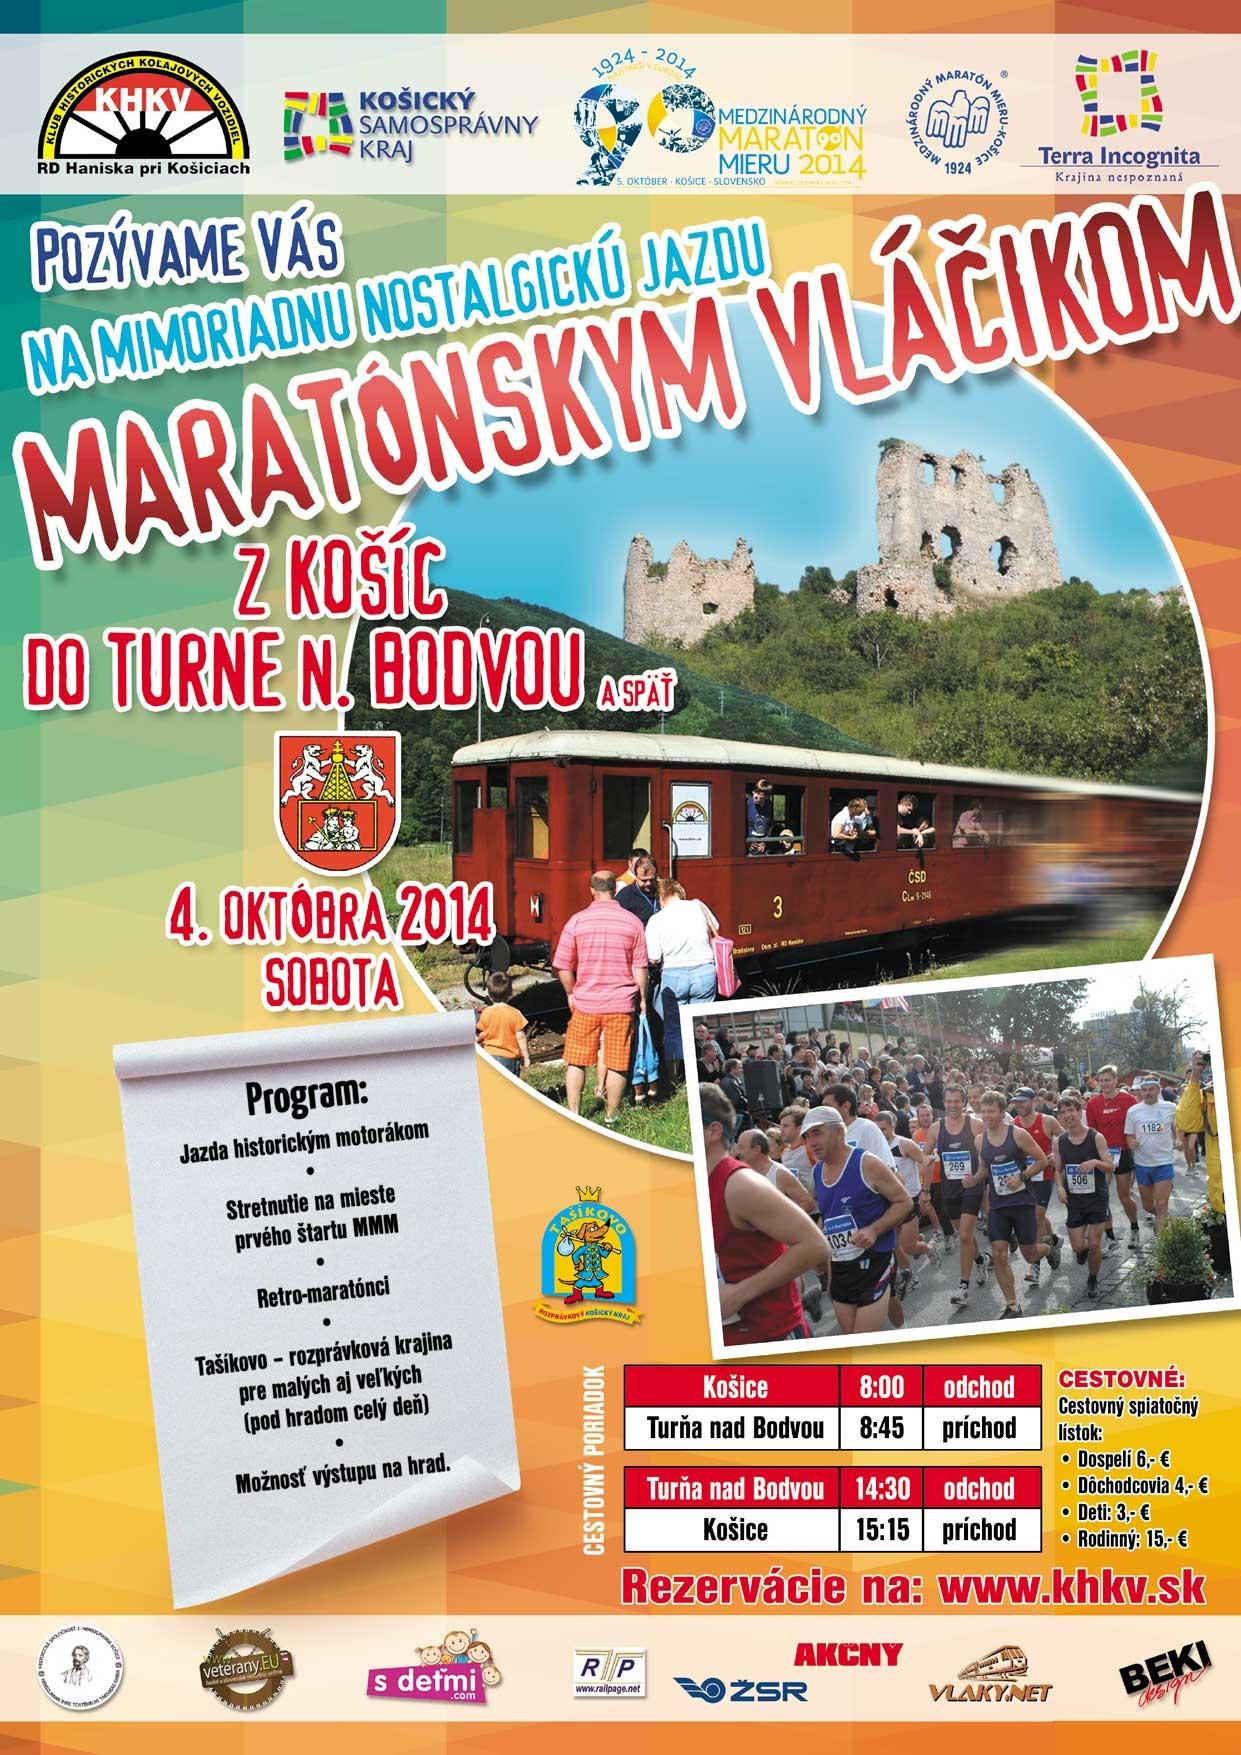 Maratonsky vlacik 2014